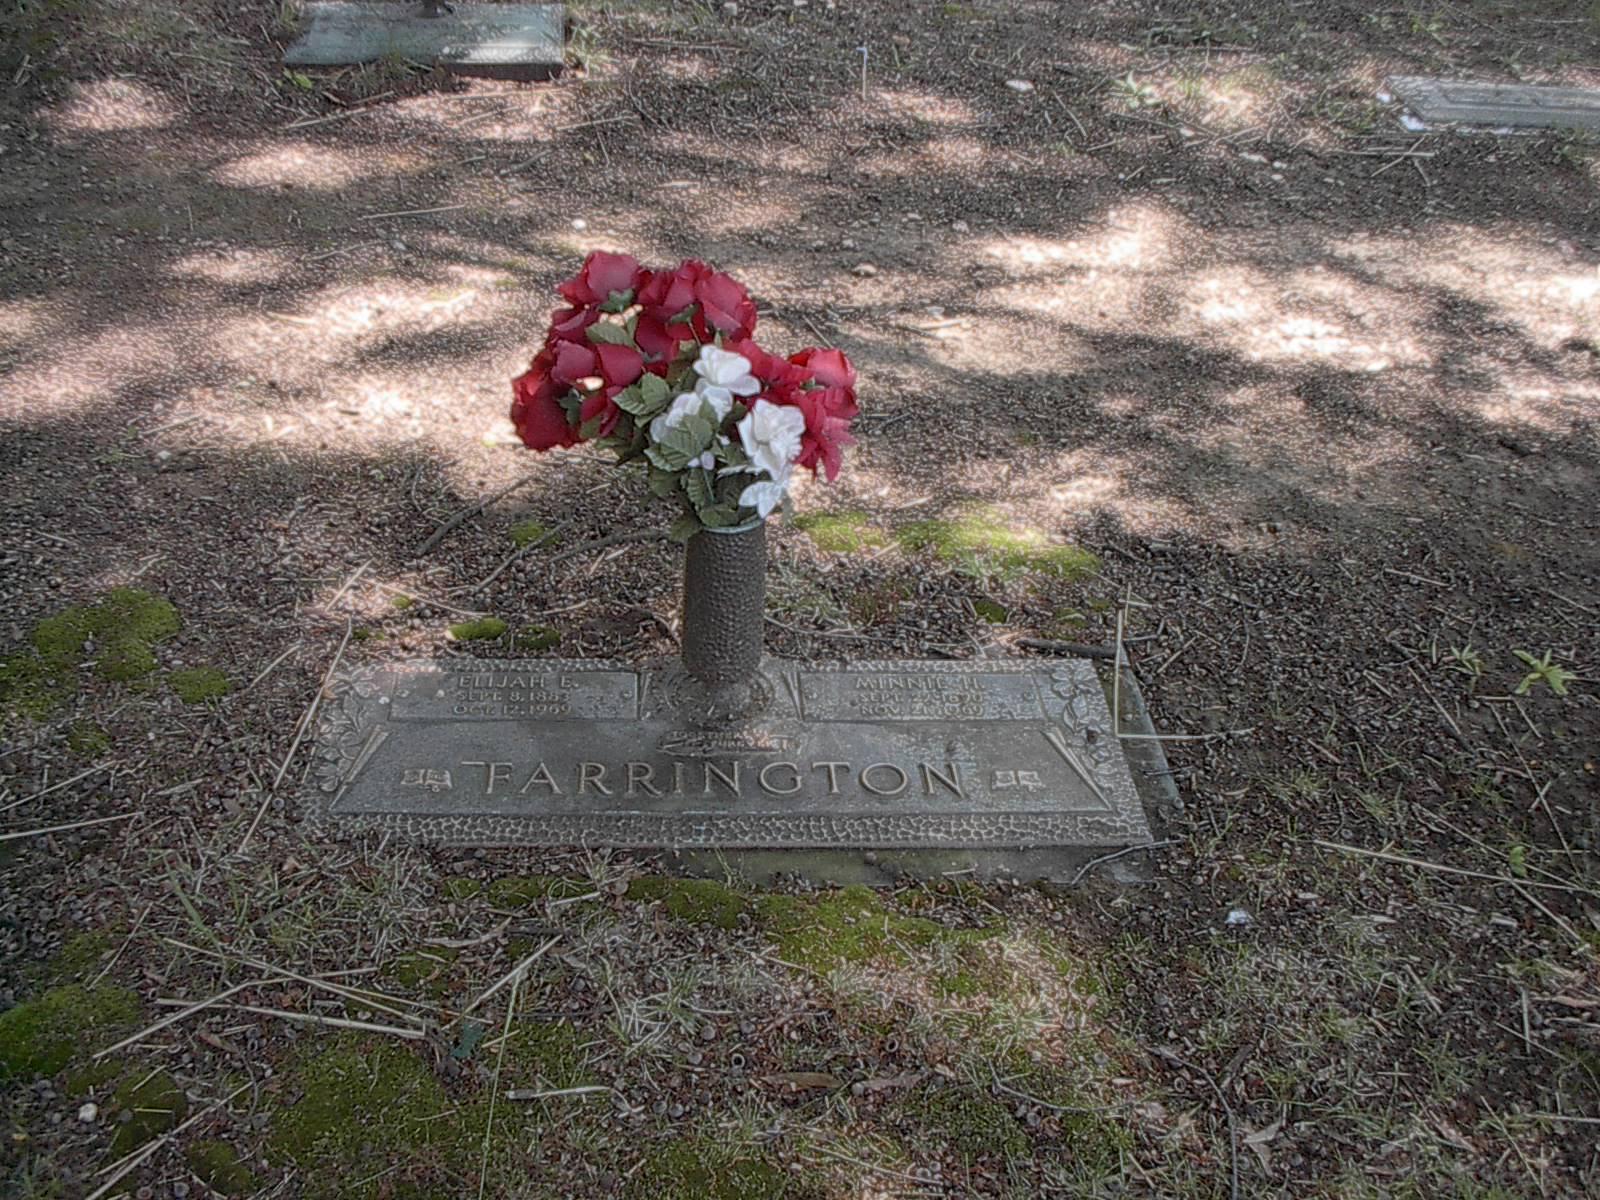 Elijah Farrington